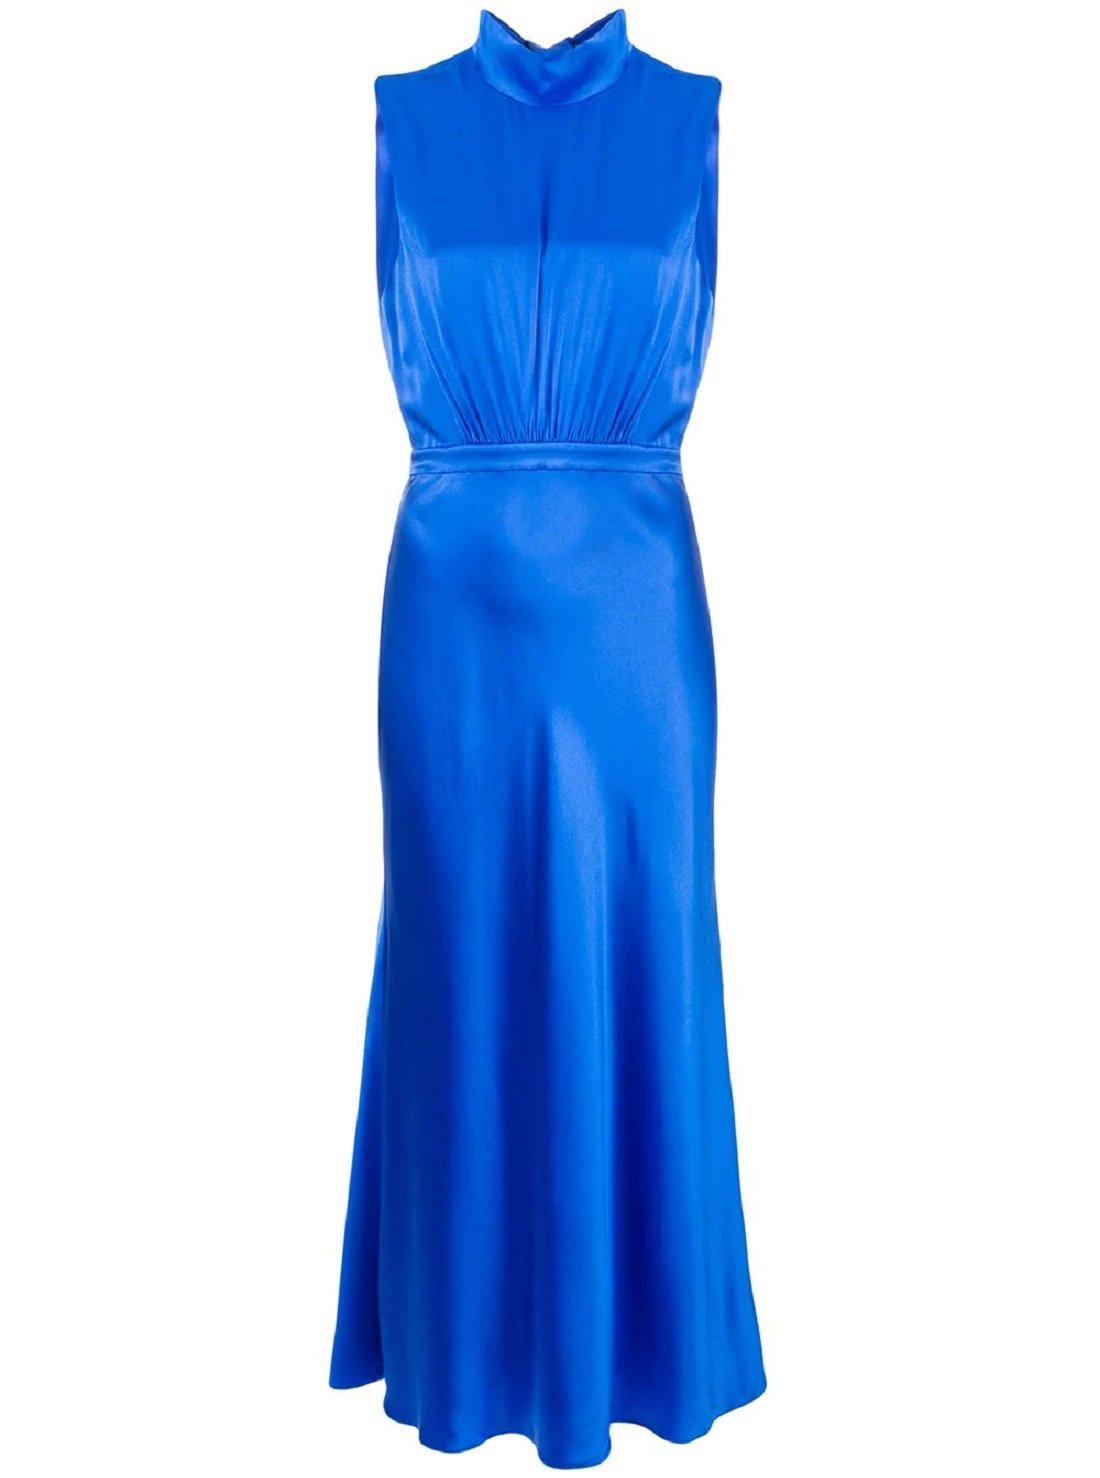 Turtleneck silk dress